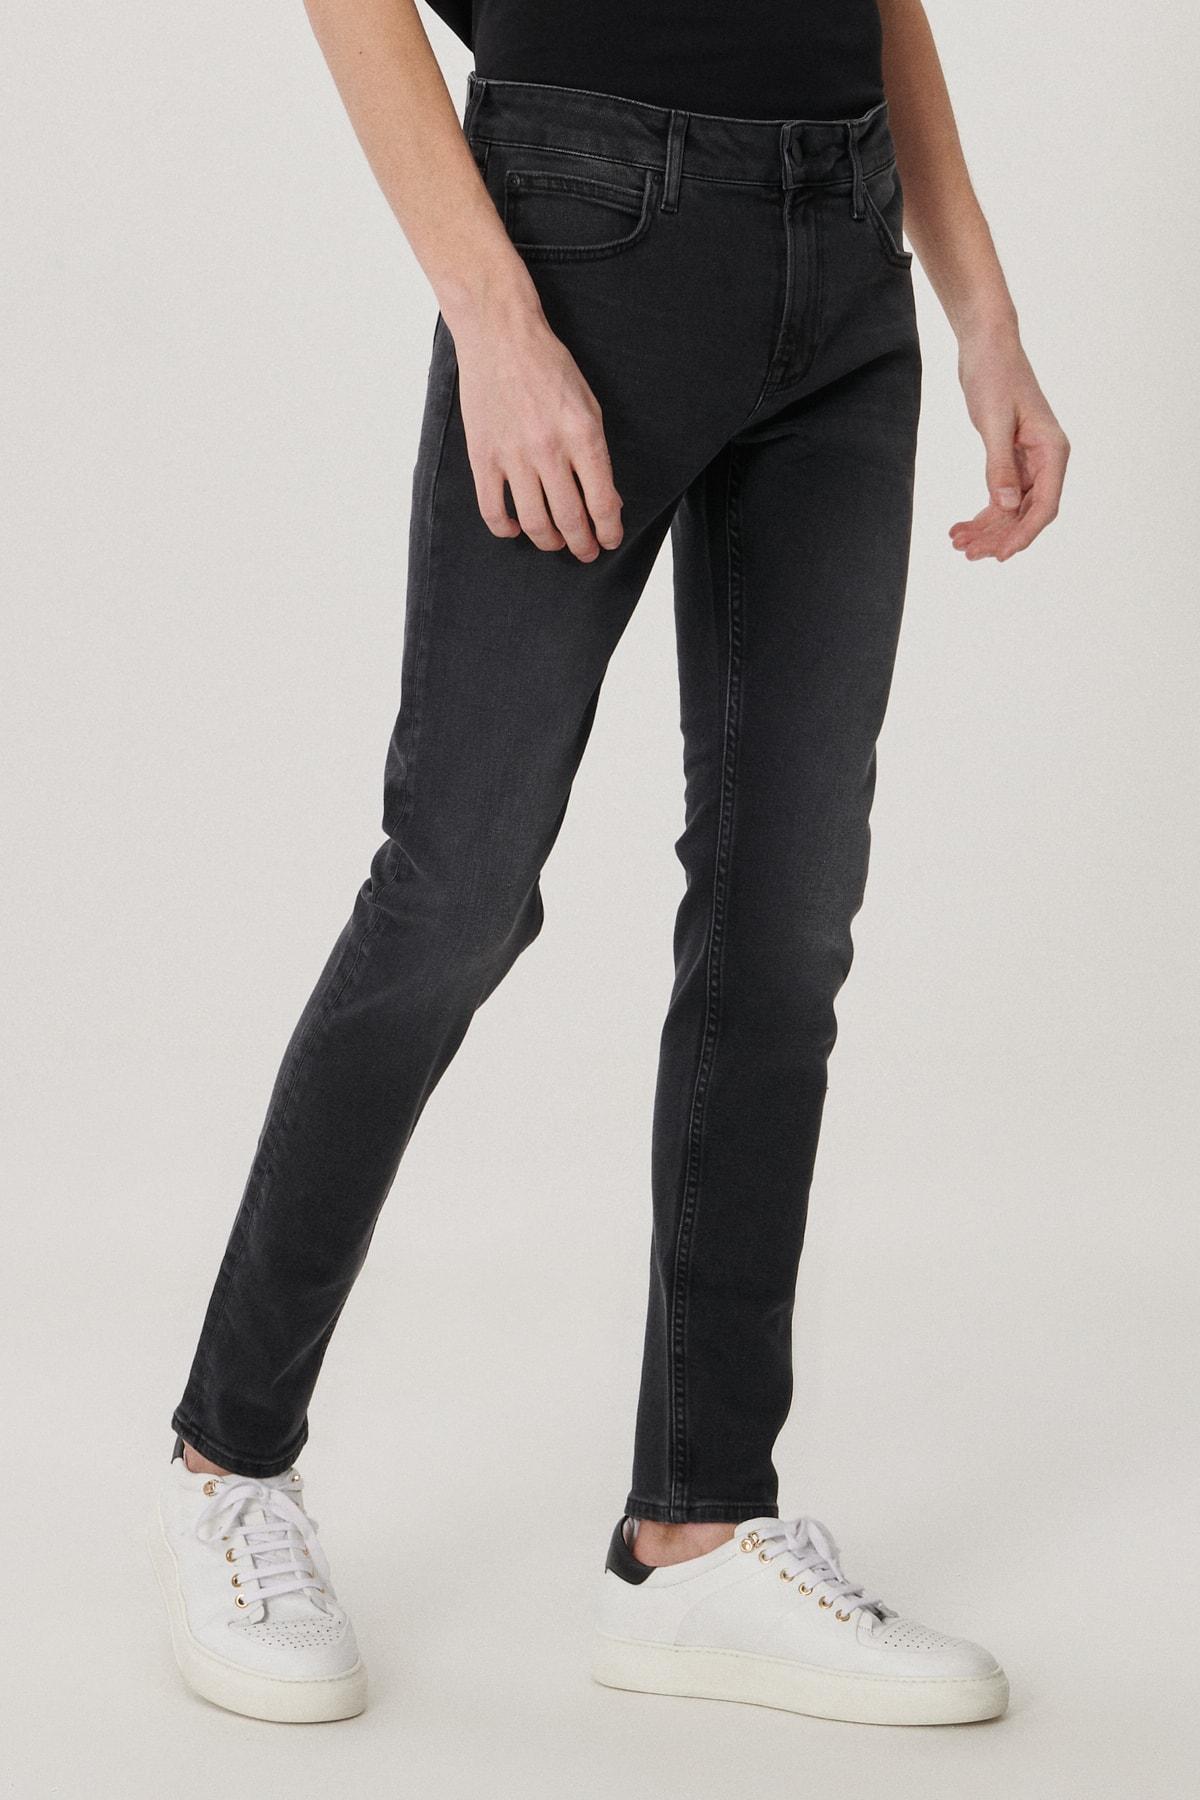 Malone Erkek Koyu Gri Skinny Normal Bel Çok Dar Paça Esnek Jean Pantolon